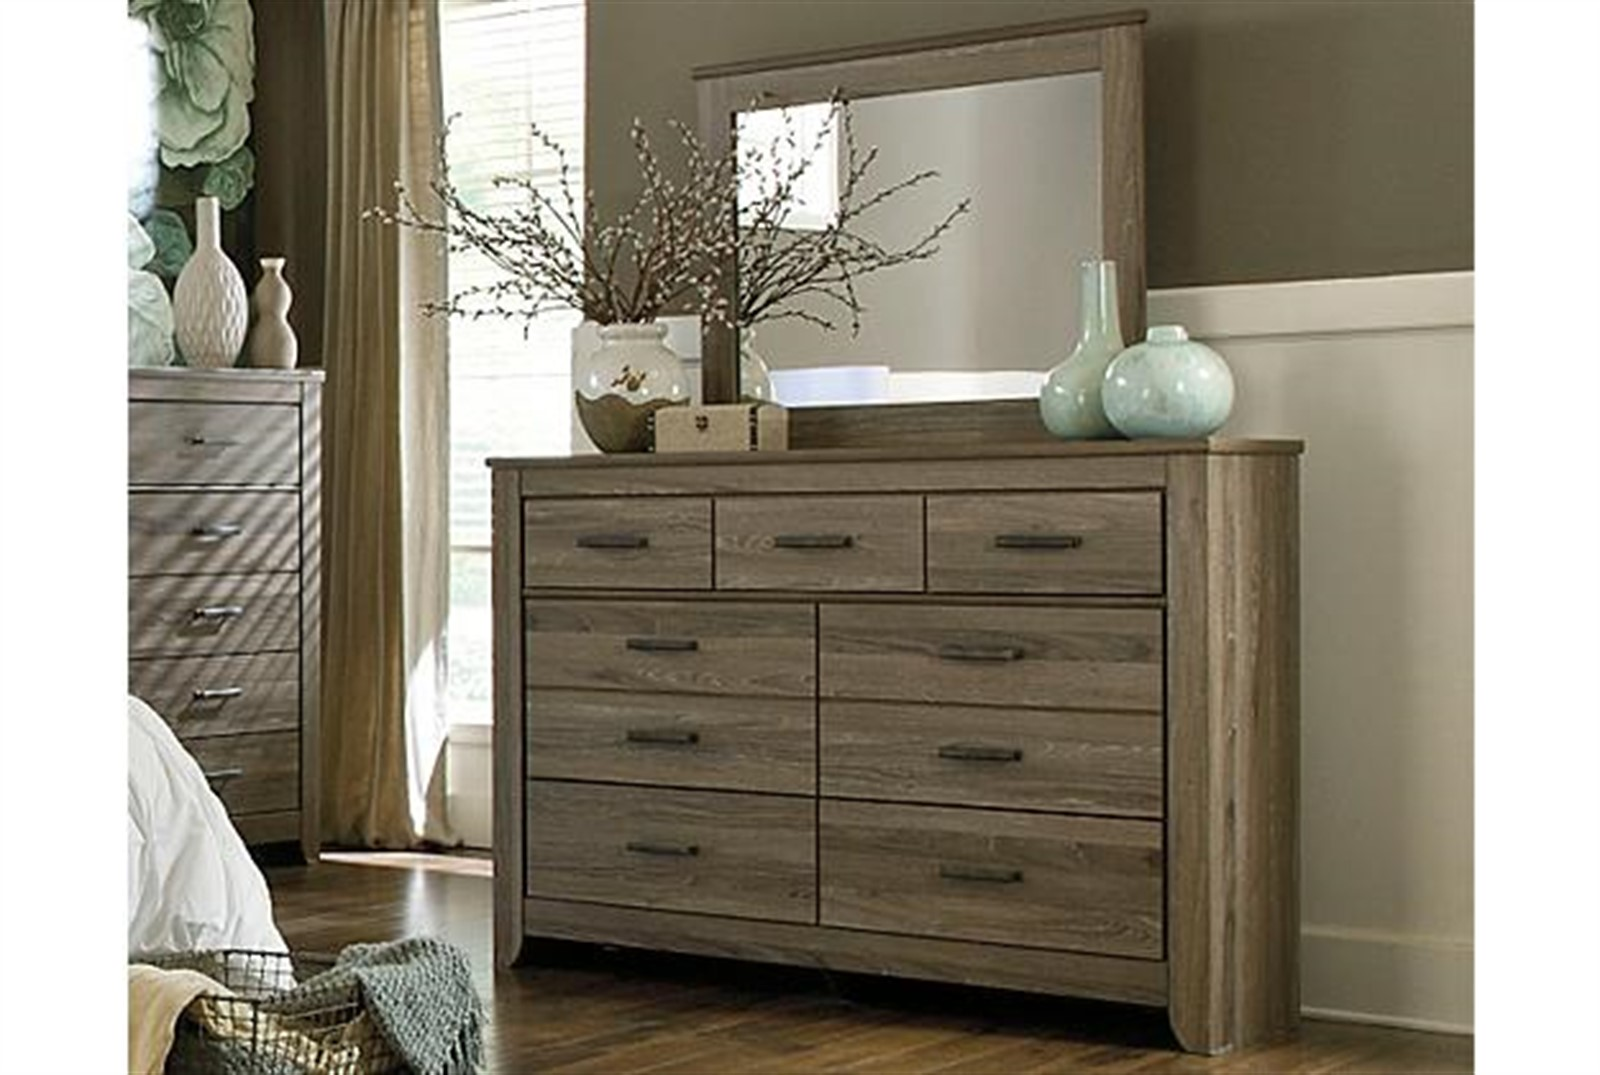 Zelen Dresser and Mirror Set - Warm Grey